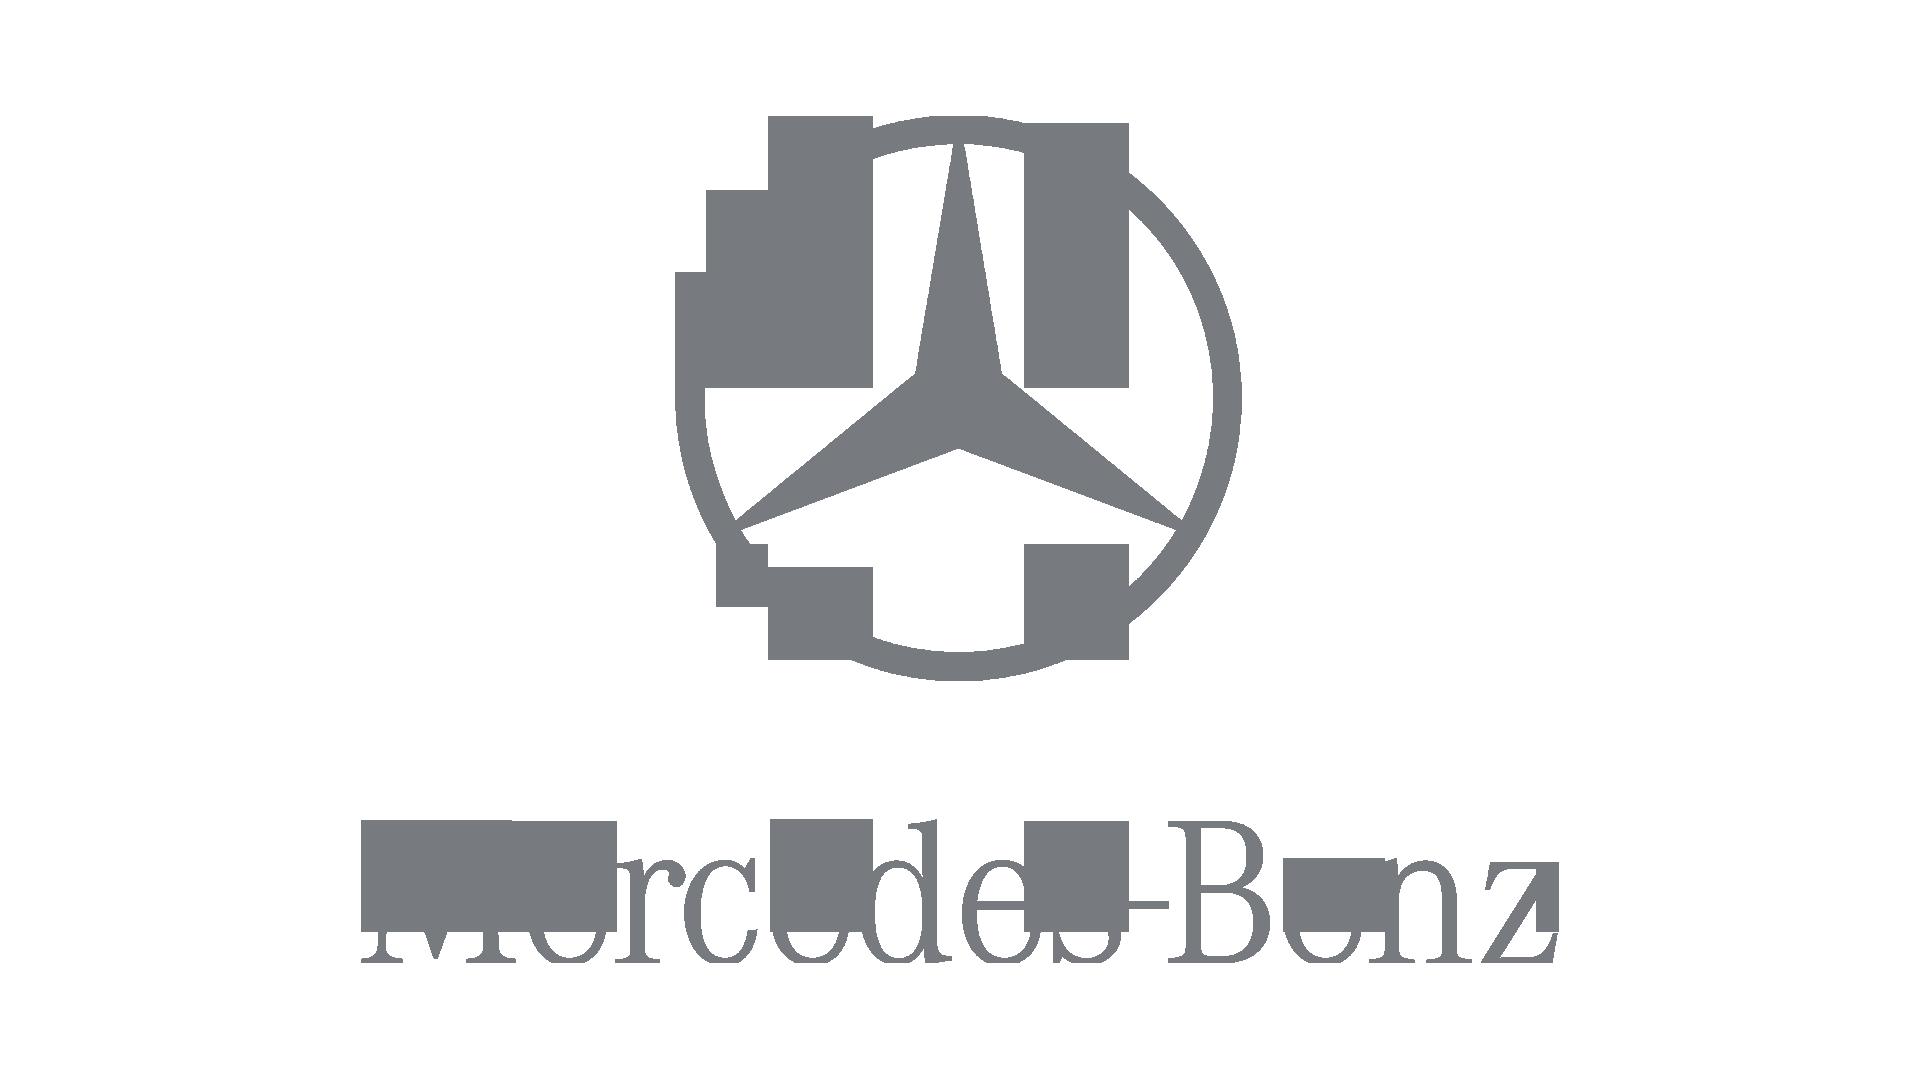 significado dos logotipos